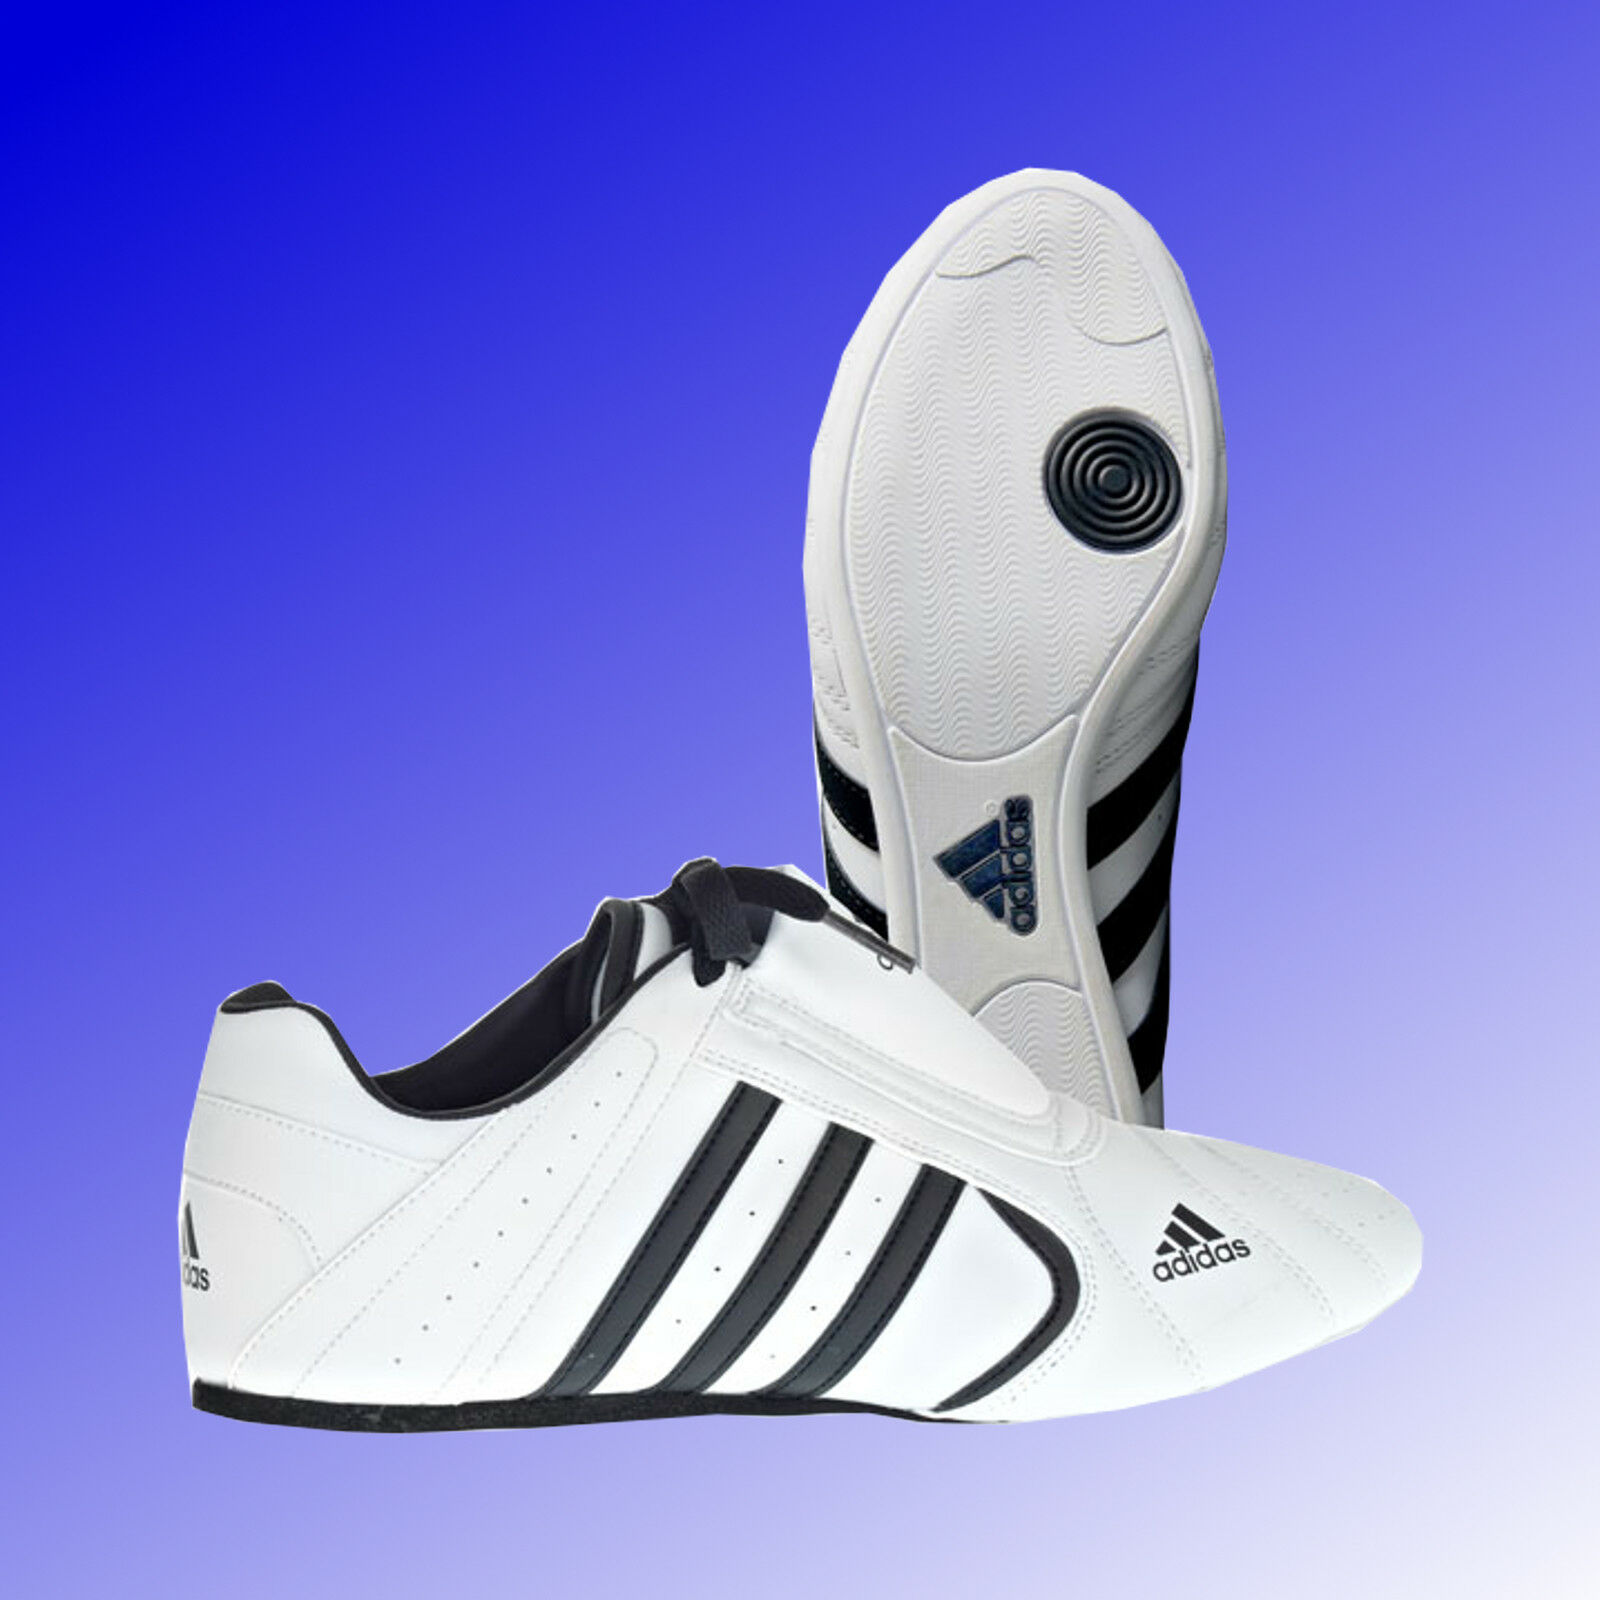 Adidas® SM III Taekwondo TKD Kampfsport Schuhe Sneaker Slipper weiß 38 - 47